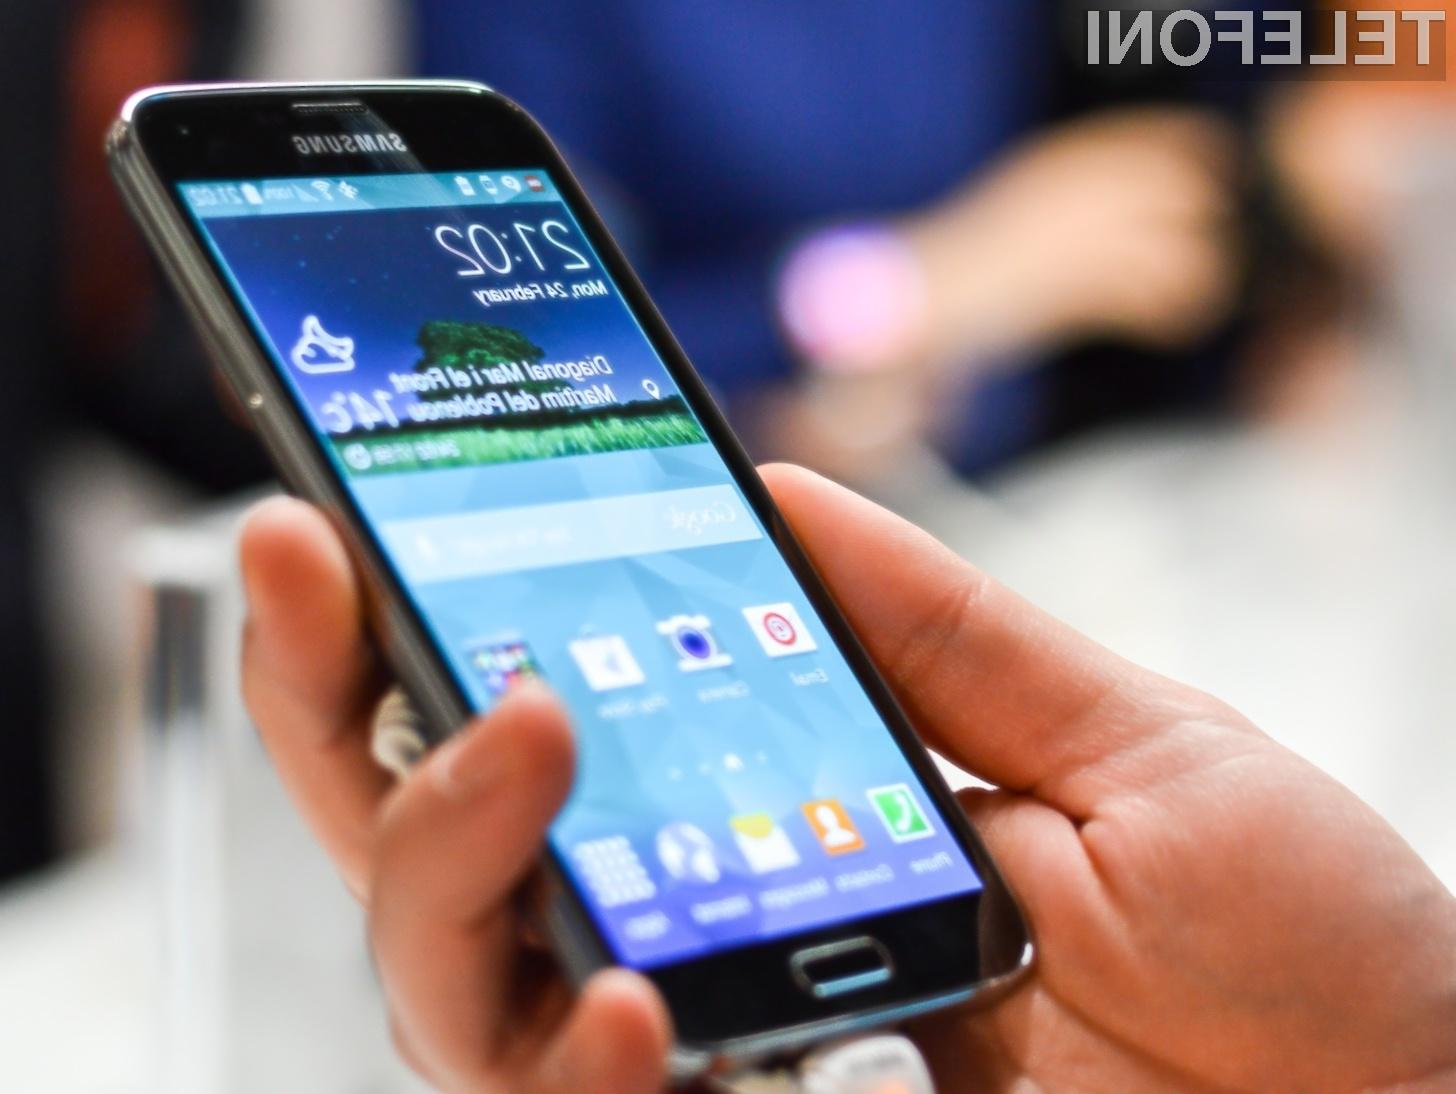 Samsung Galaxy F: Izboljšani Galaxy S5 s kovinskim ohišjem?